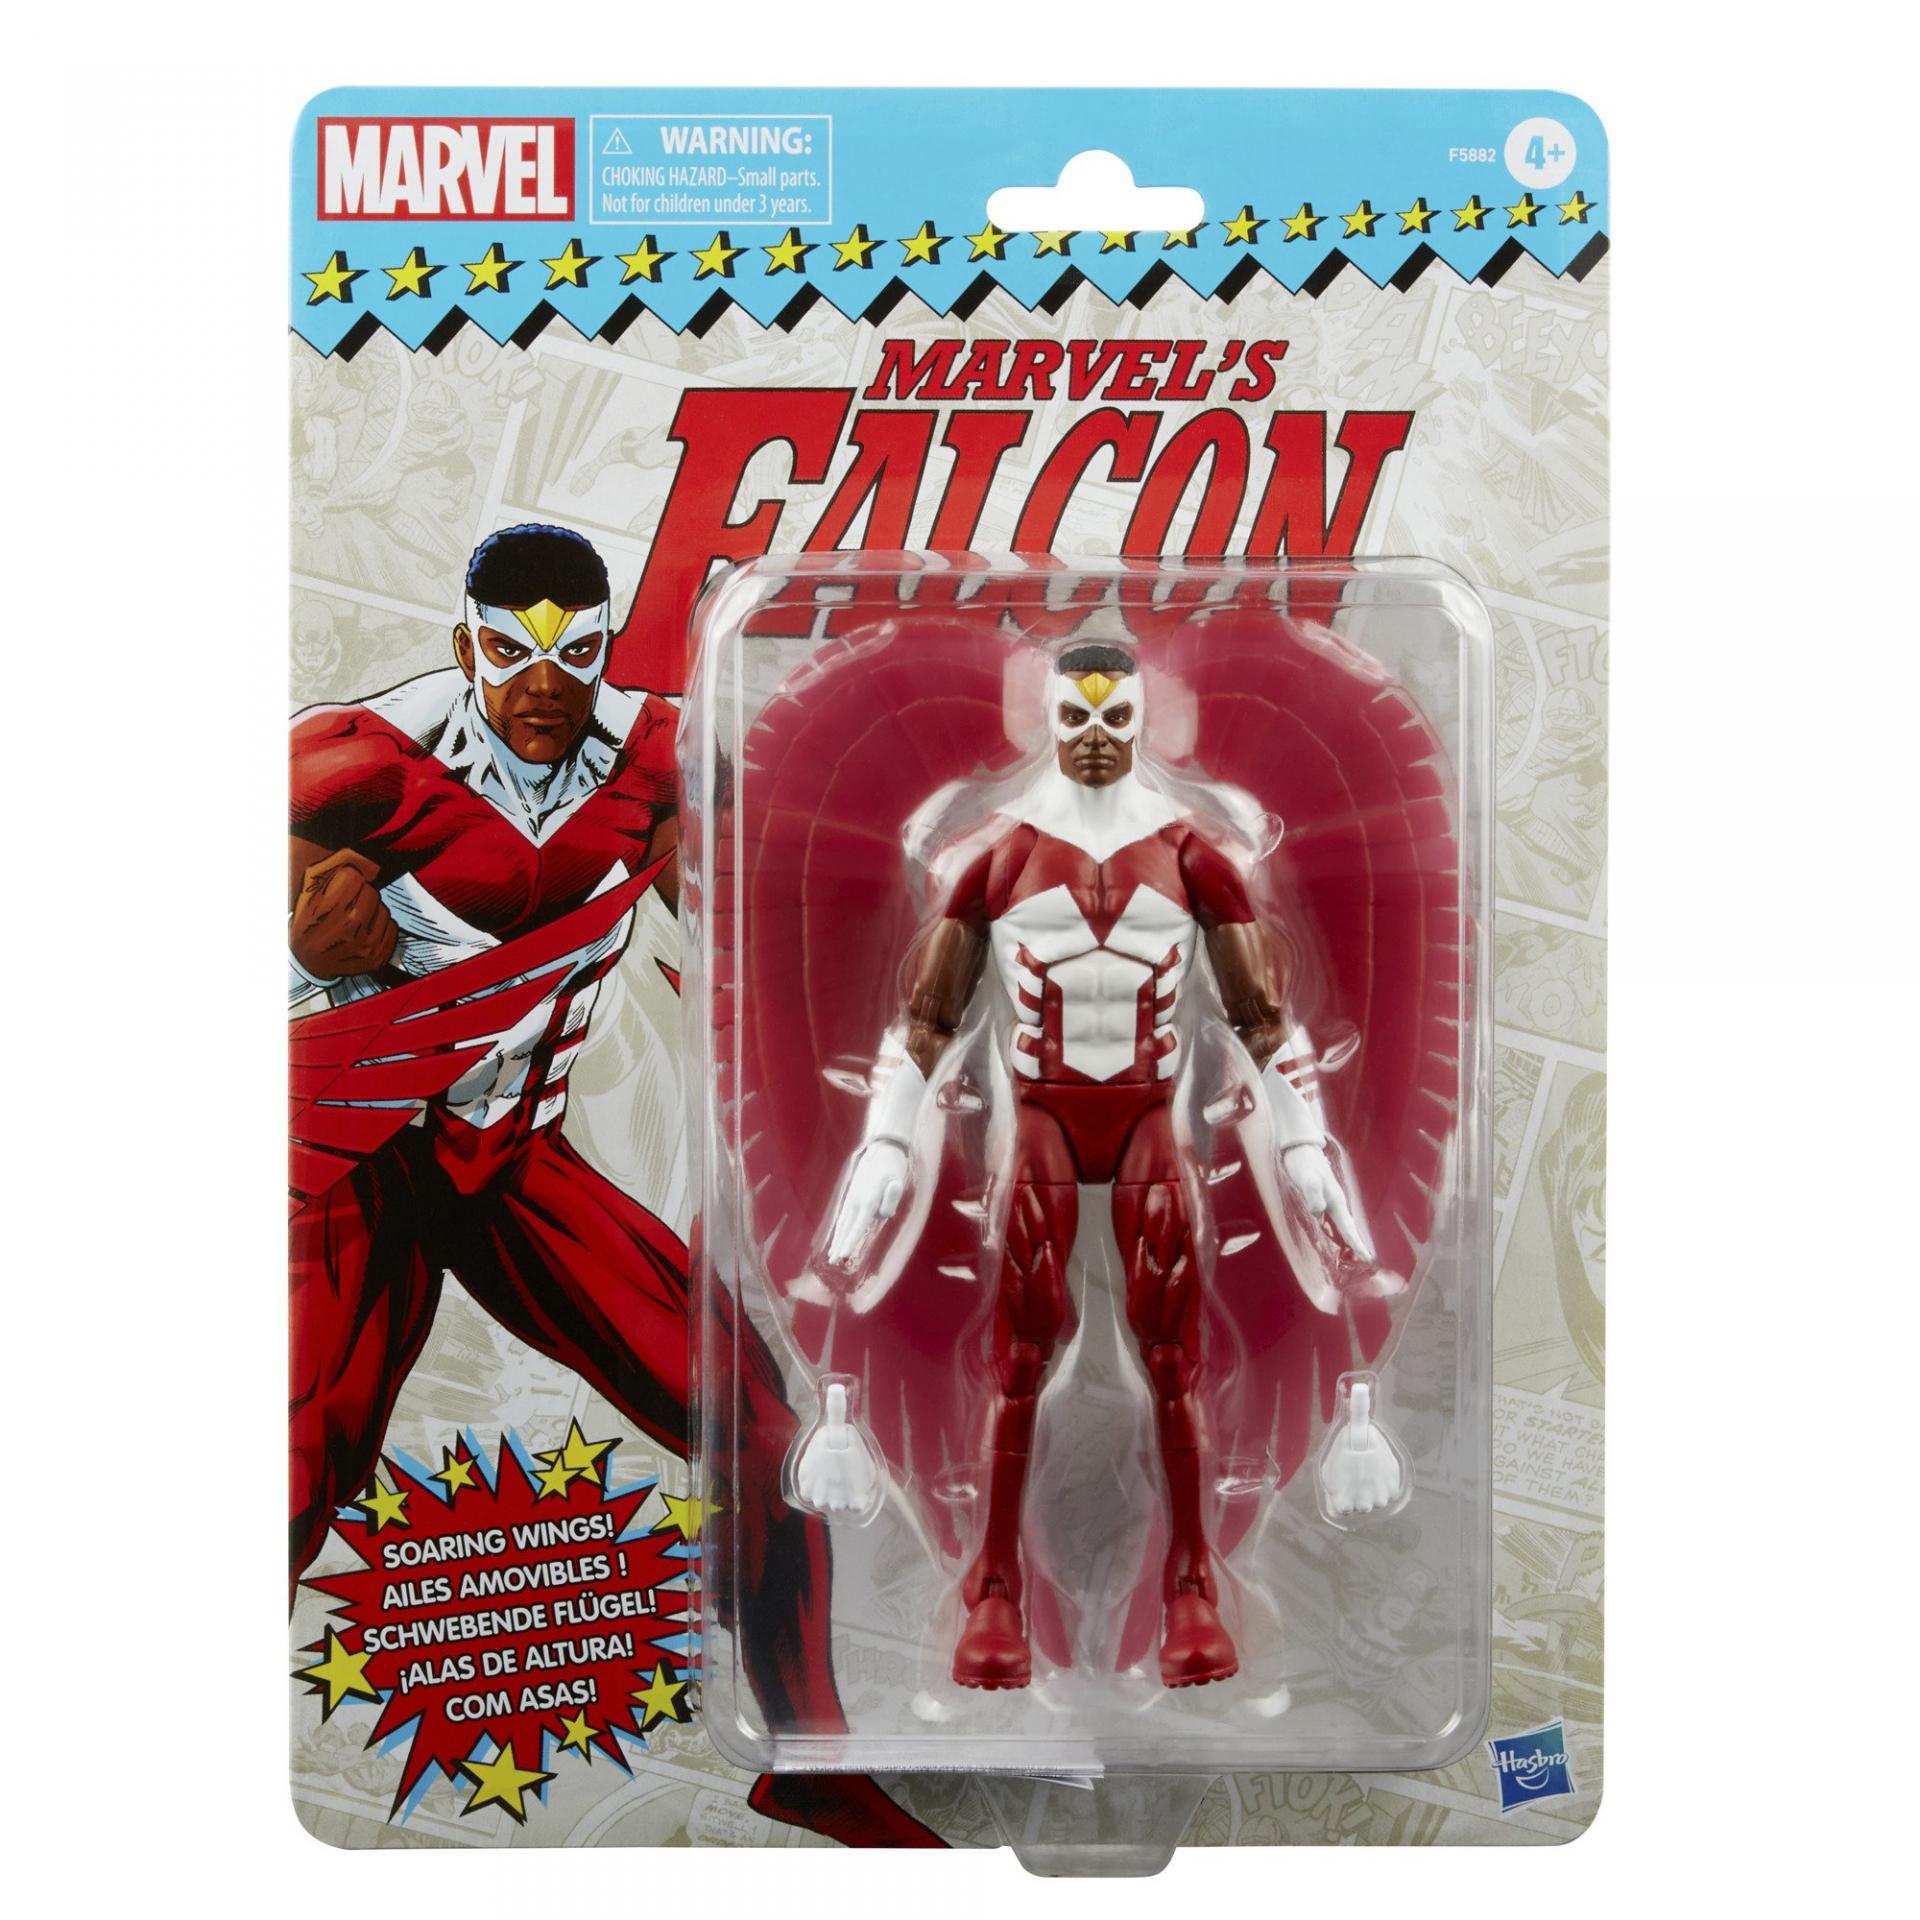 Marvel legends series hasbro marvel s falcon2